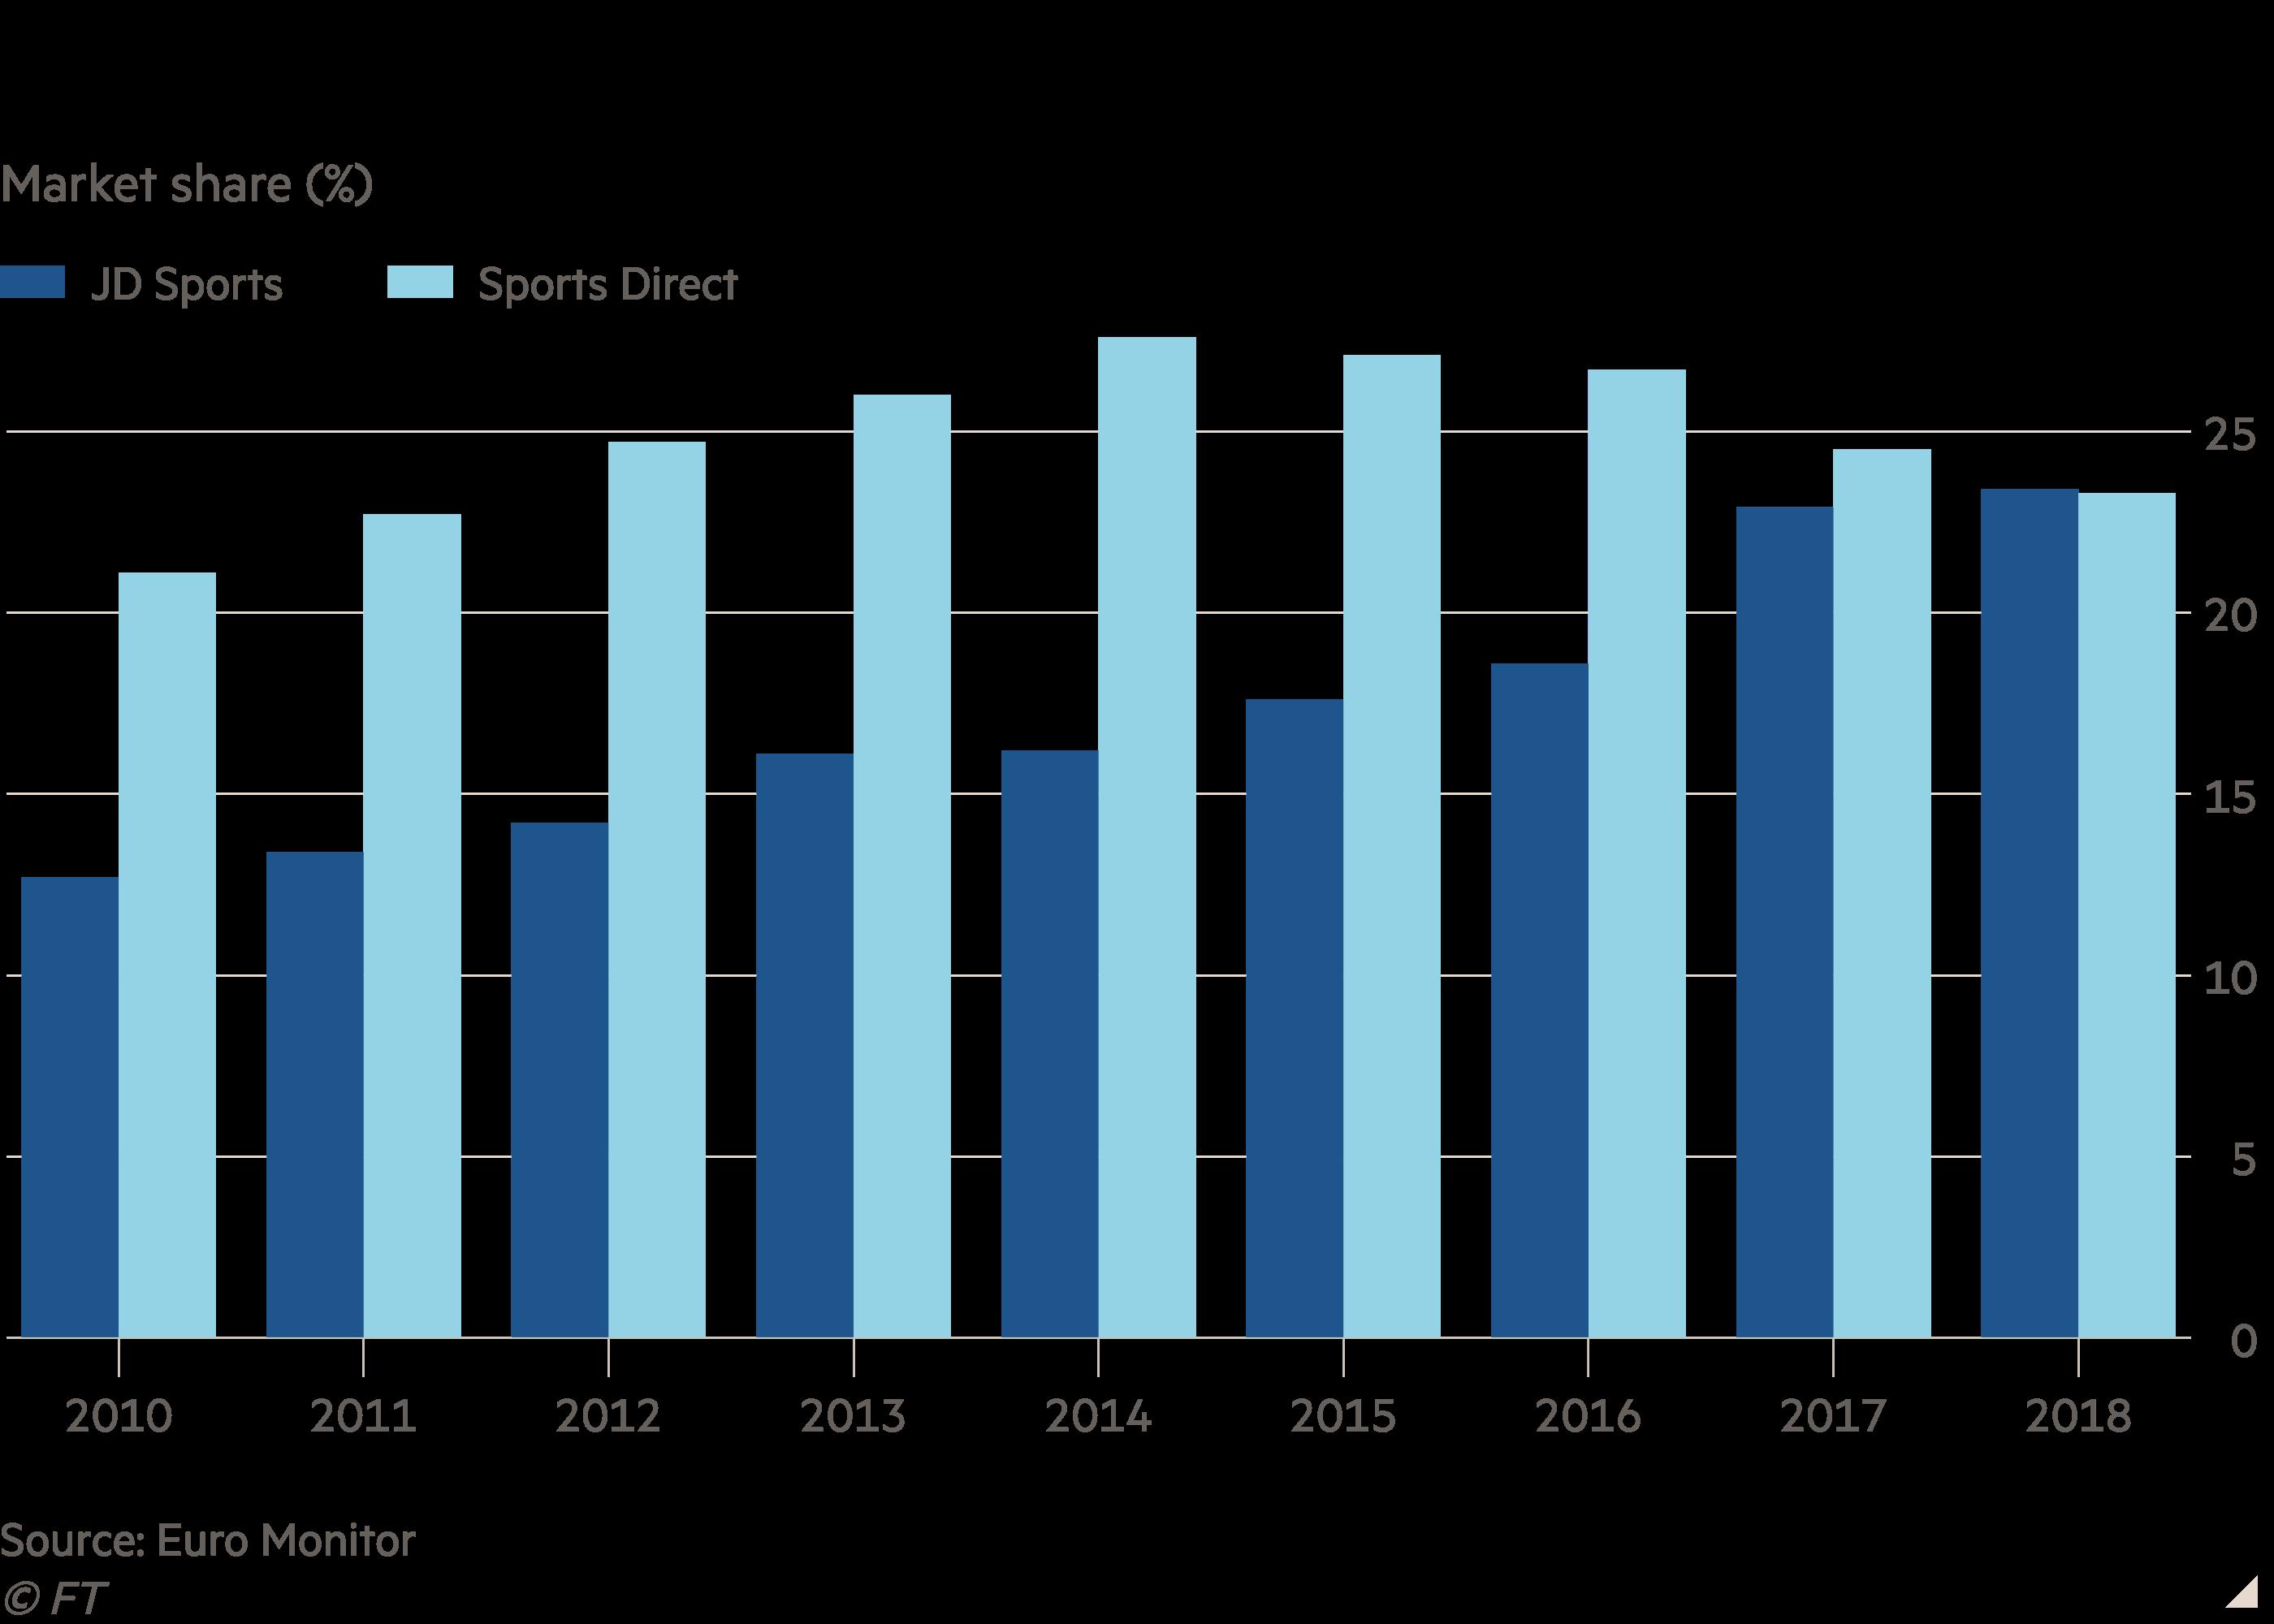 Column chart of Market share (%) showing UK sports retailing